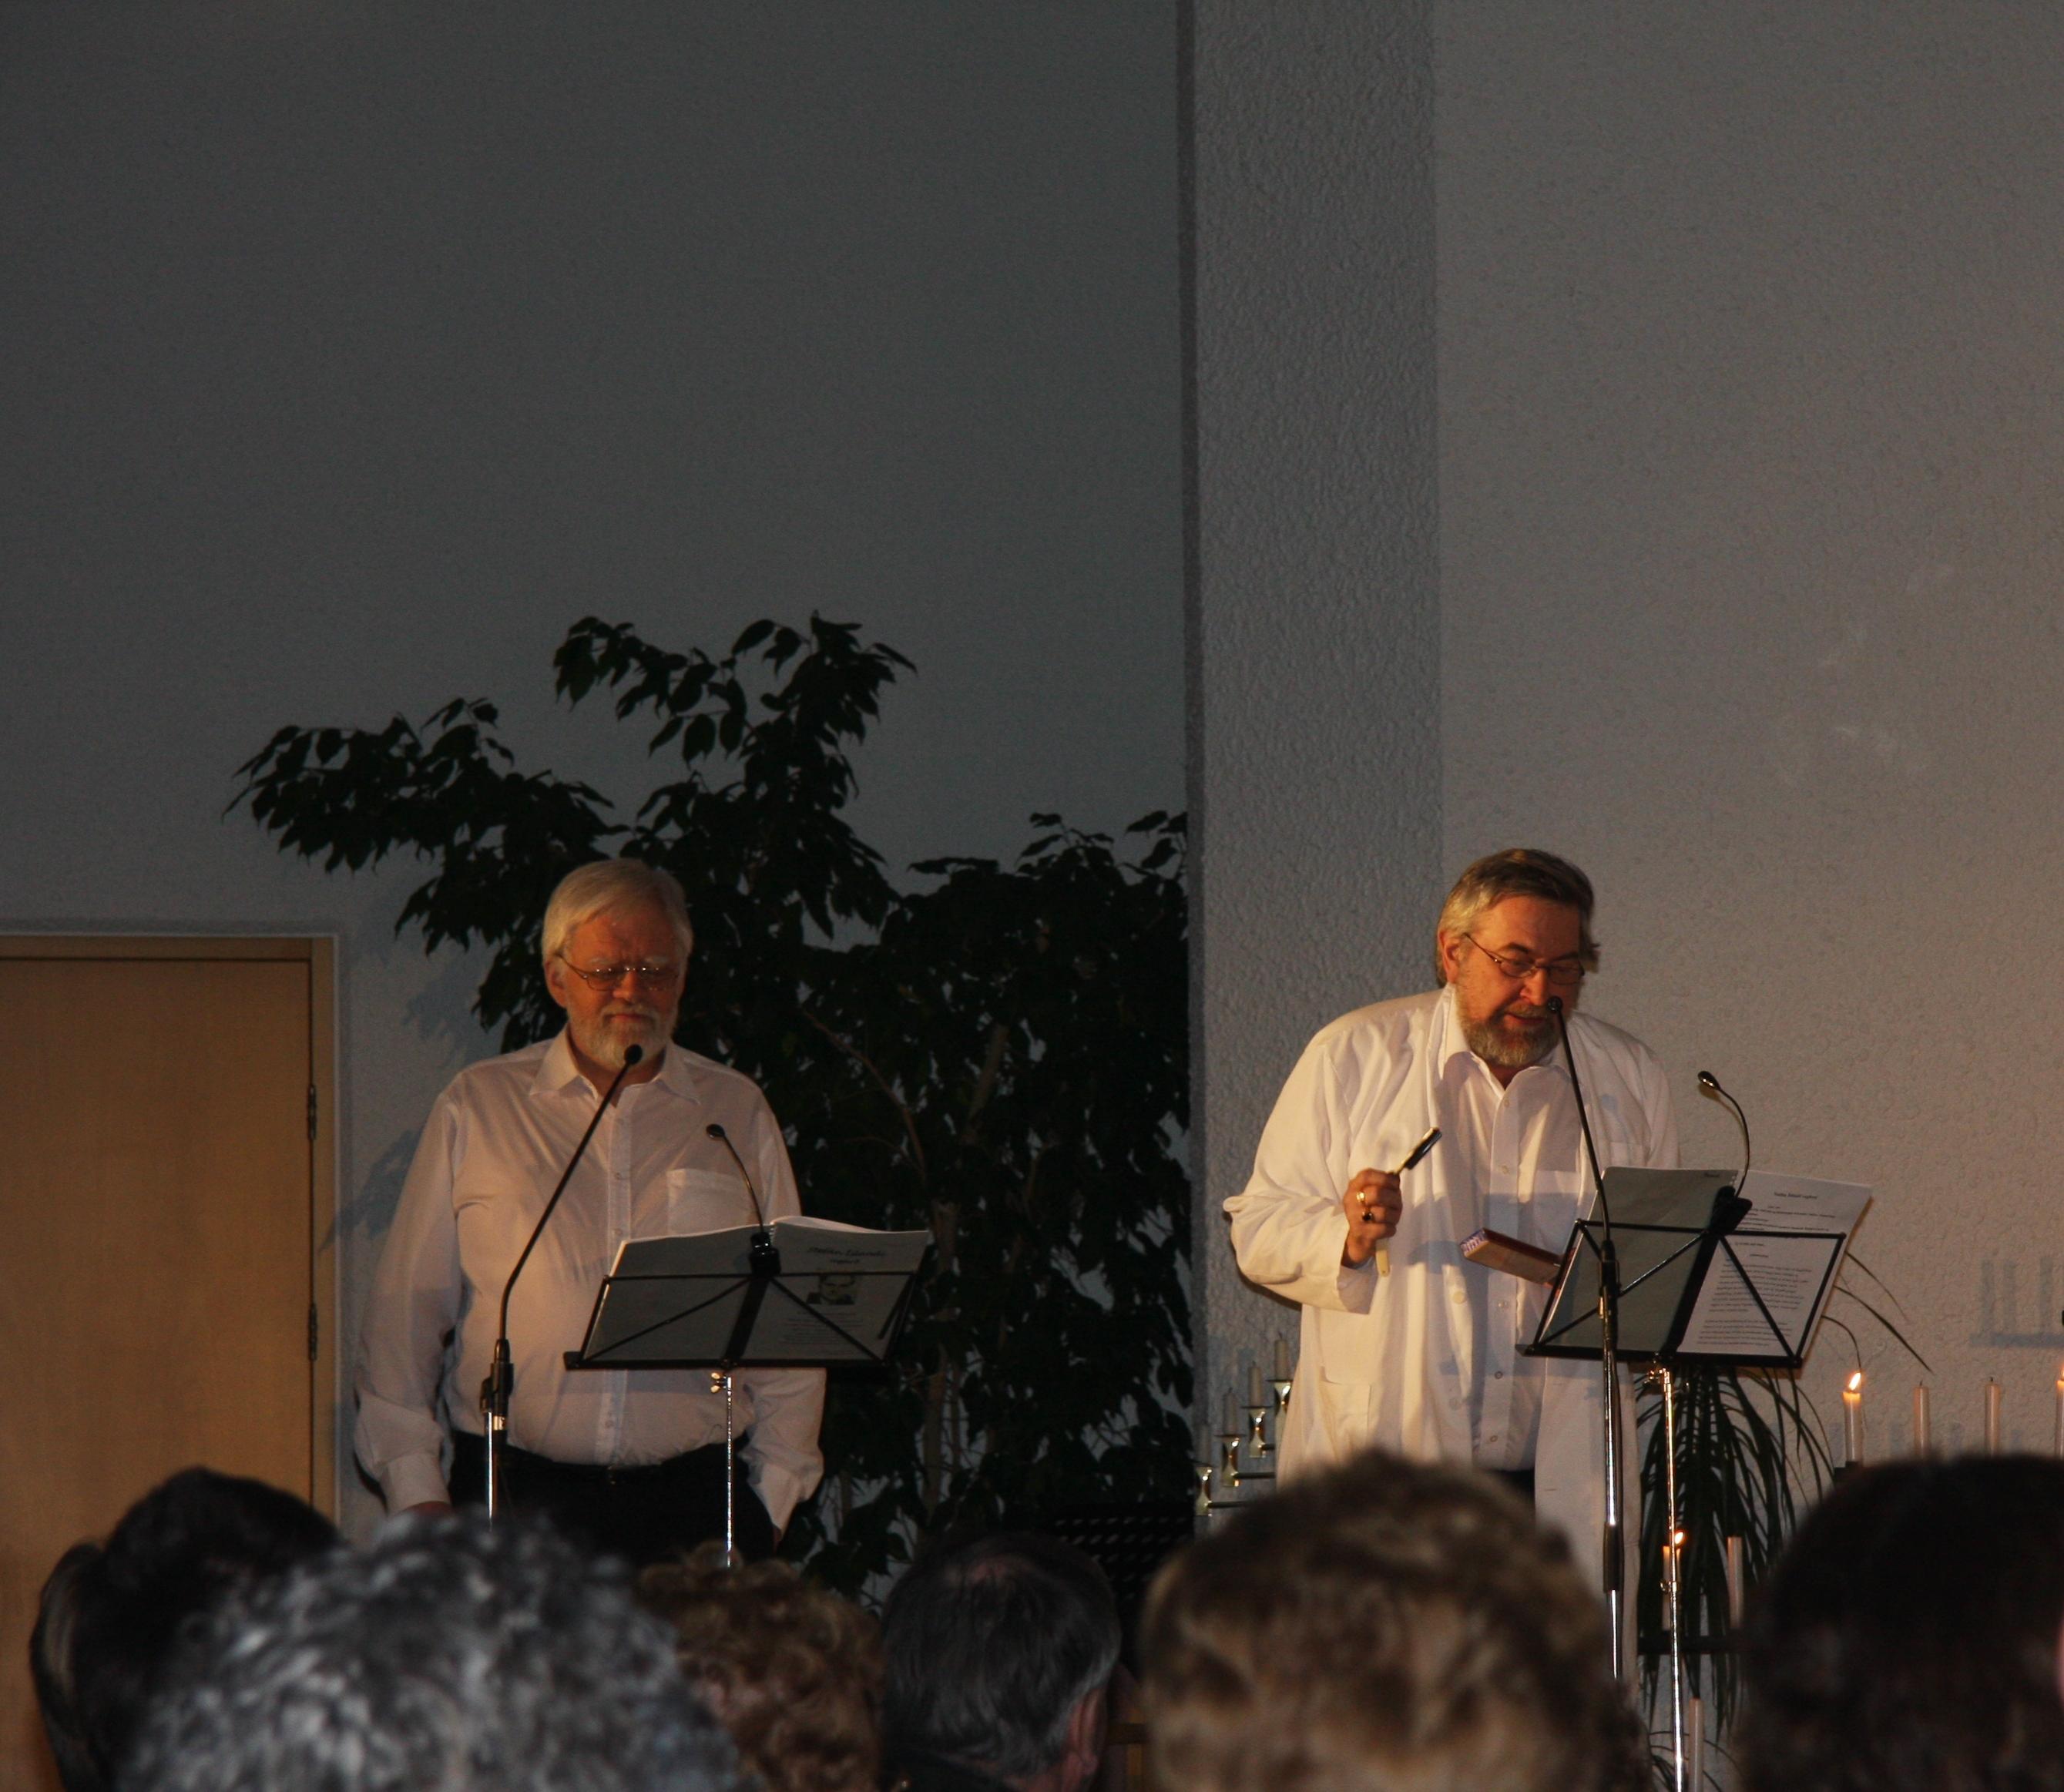 Agnar og Hannes